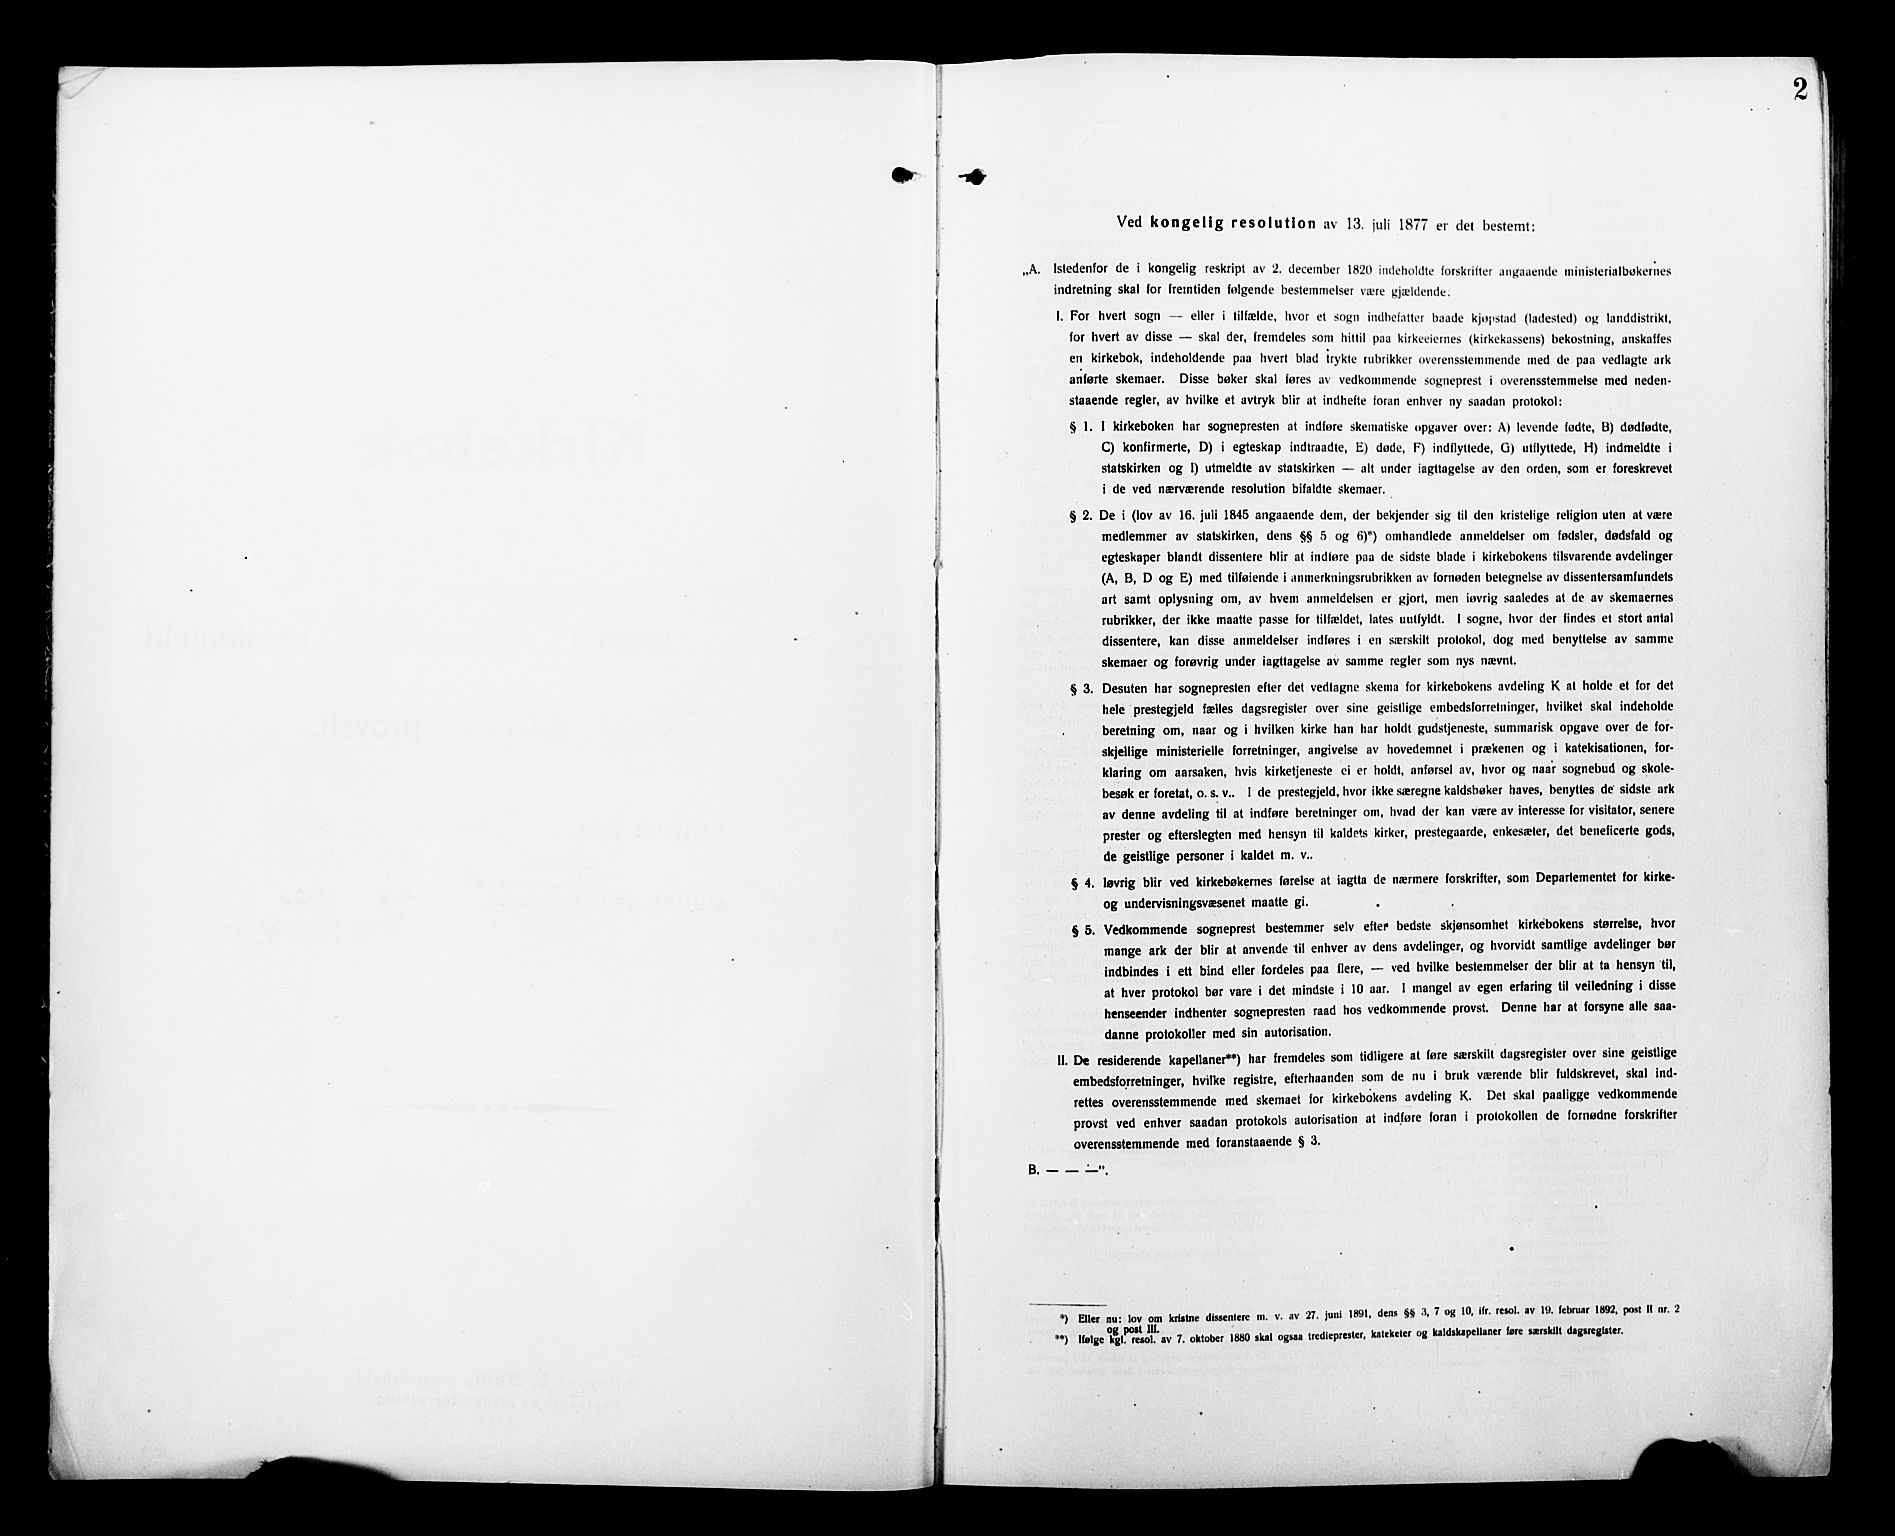 SATØ, Tromsø sokneprestkontor/stiftsprosti/domprosti, G/Gb/L0009klokker: Klokkerbok nr. 9, 1915-1925, s. 2